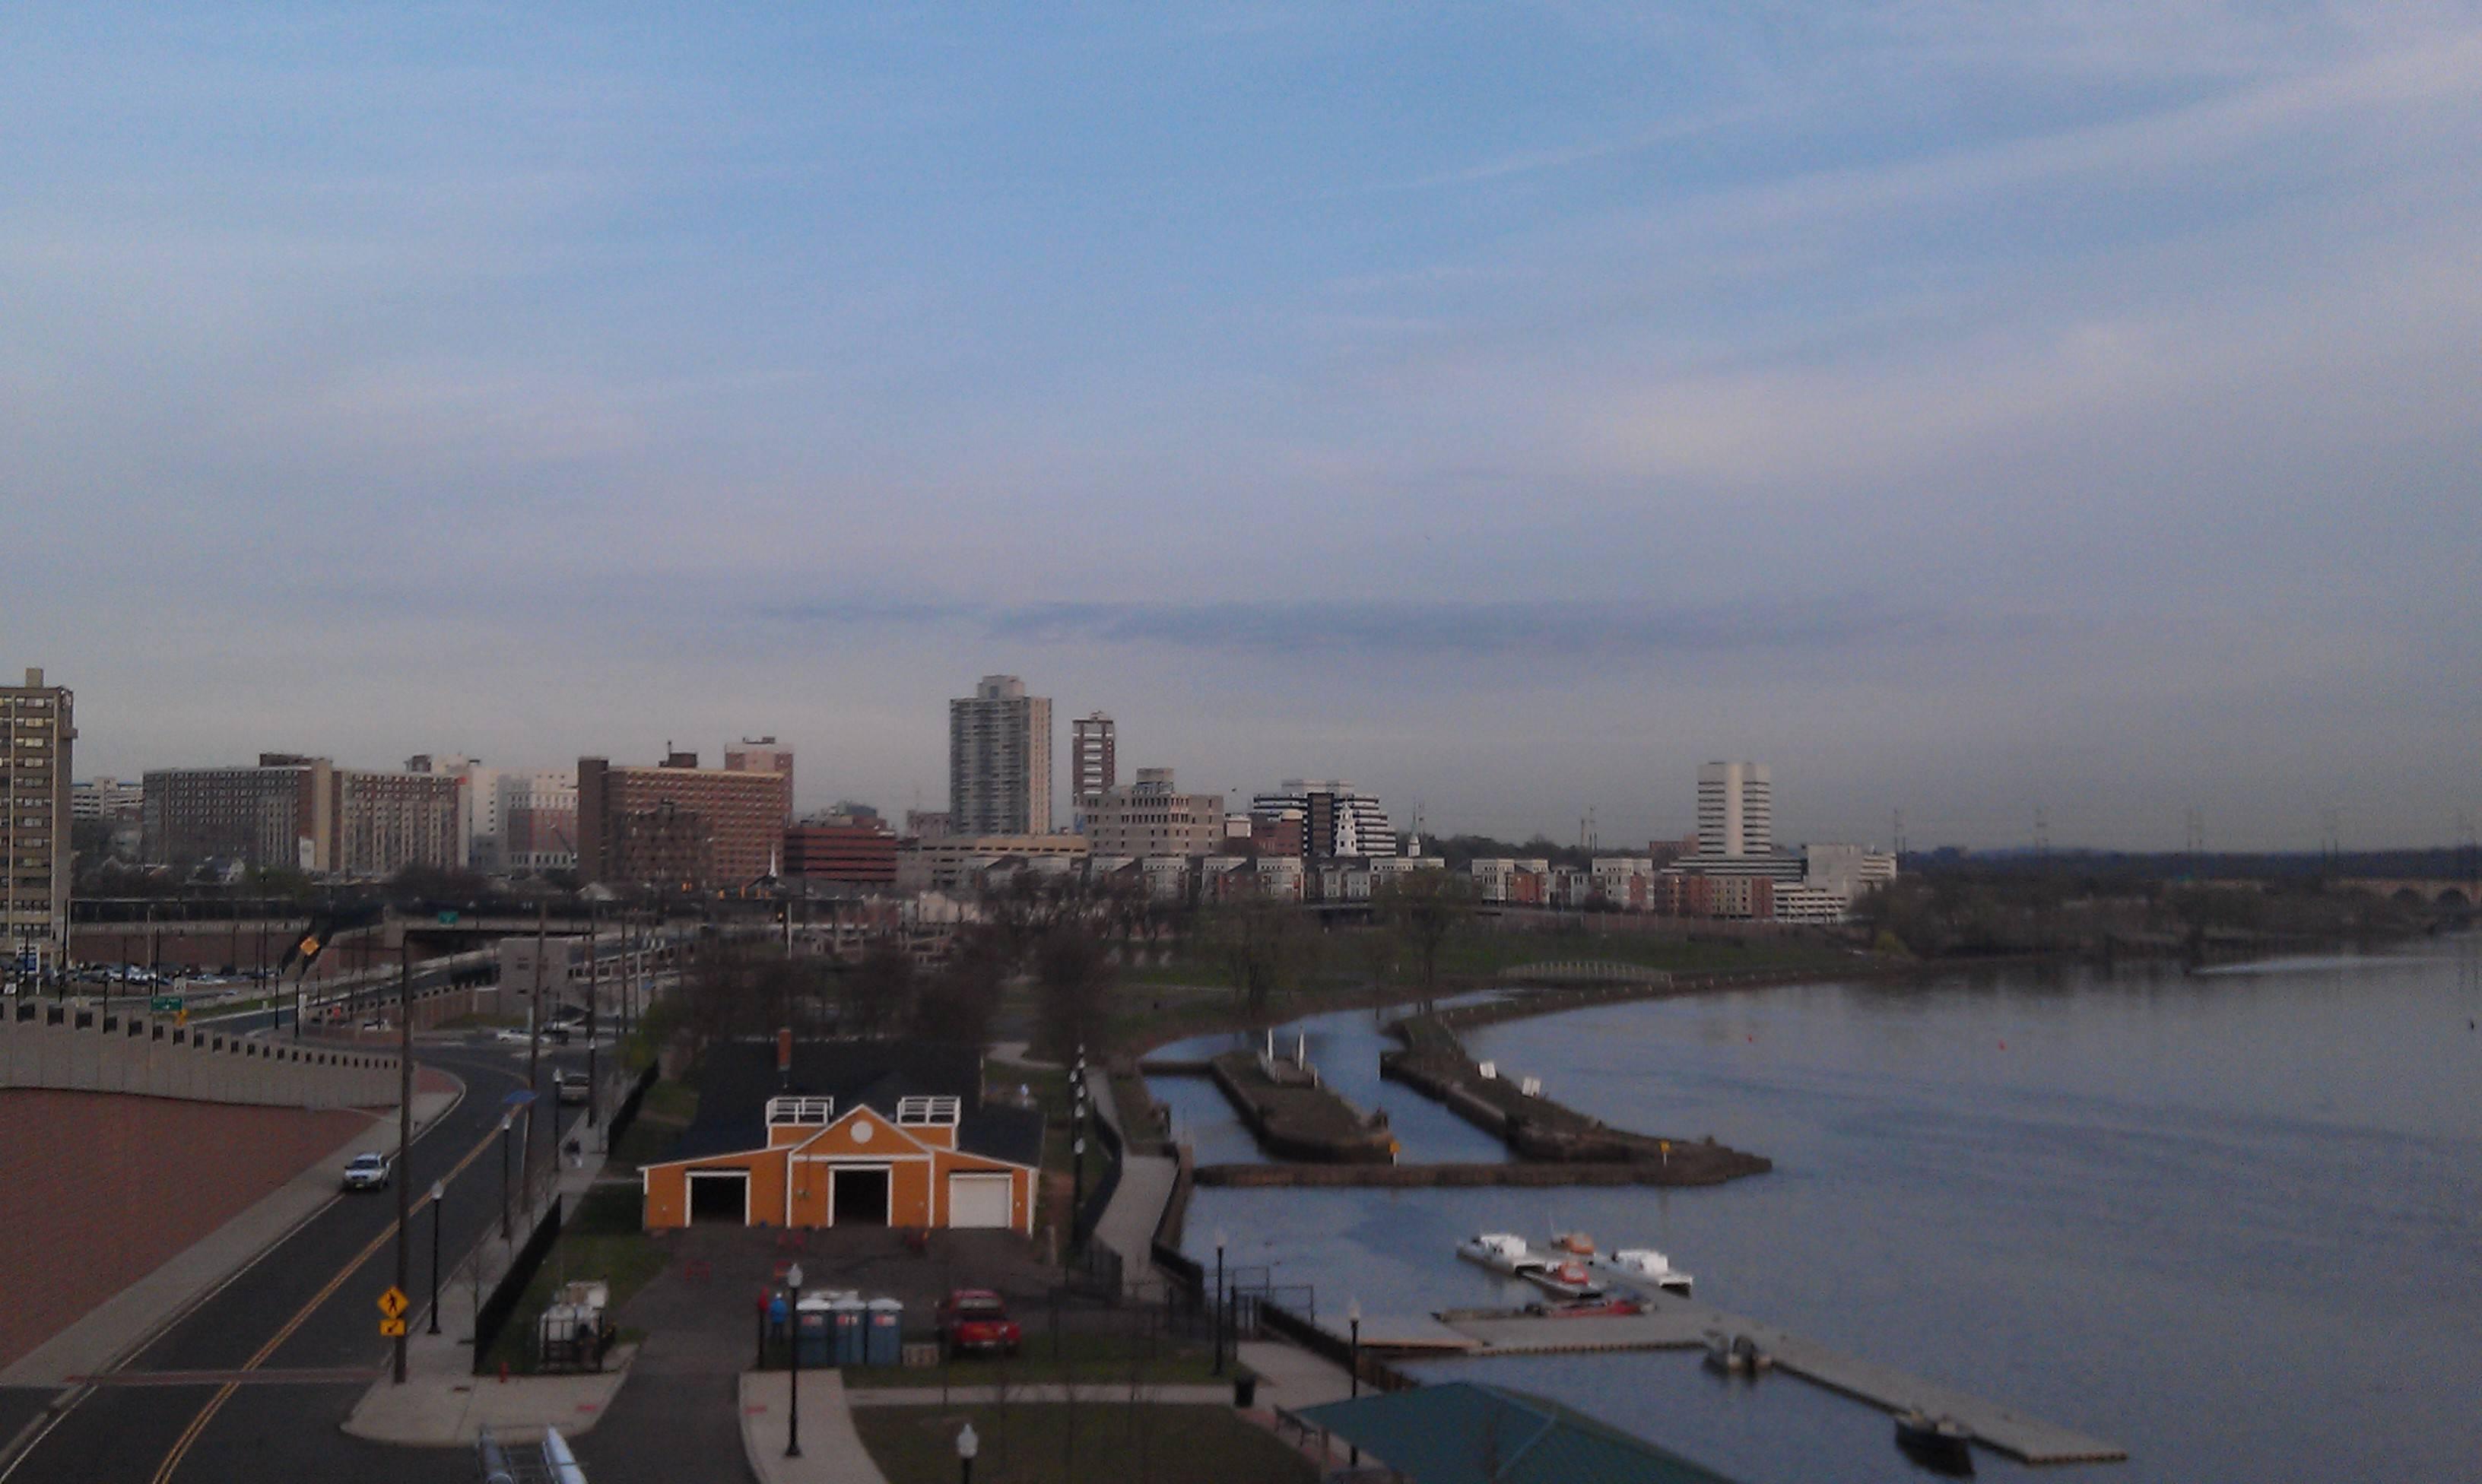 b82657b3b71353f6802d_New_Brunswick_Skyline_with_Raritan_River.jpg